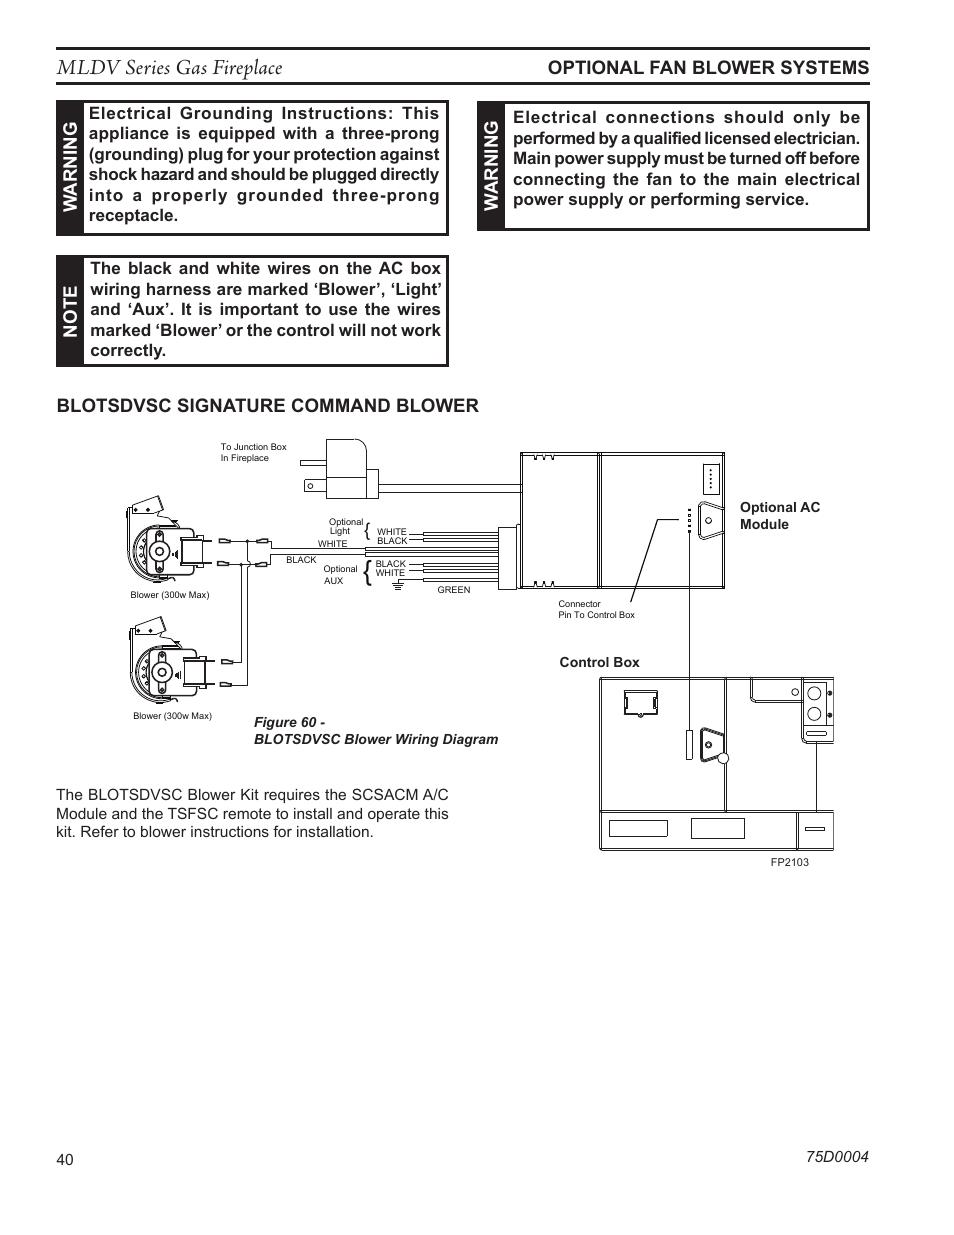 Mldv series gas fireplace, Fp2684 blotsdvsc fan wiring ... on